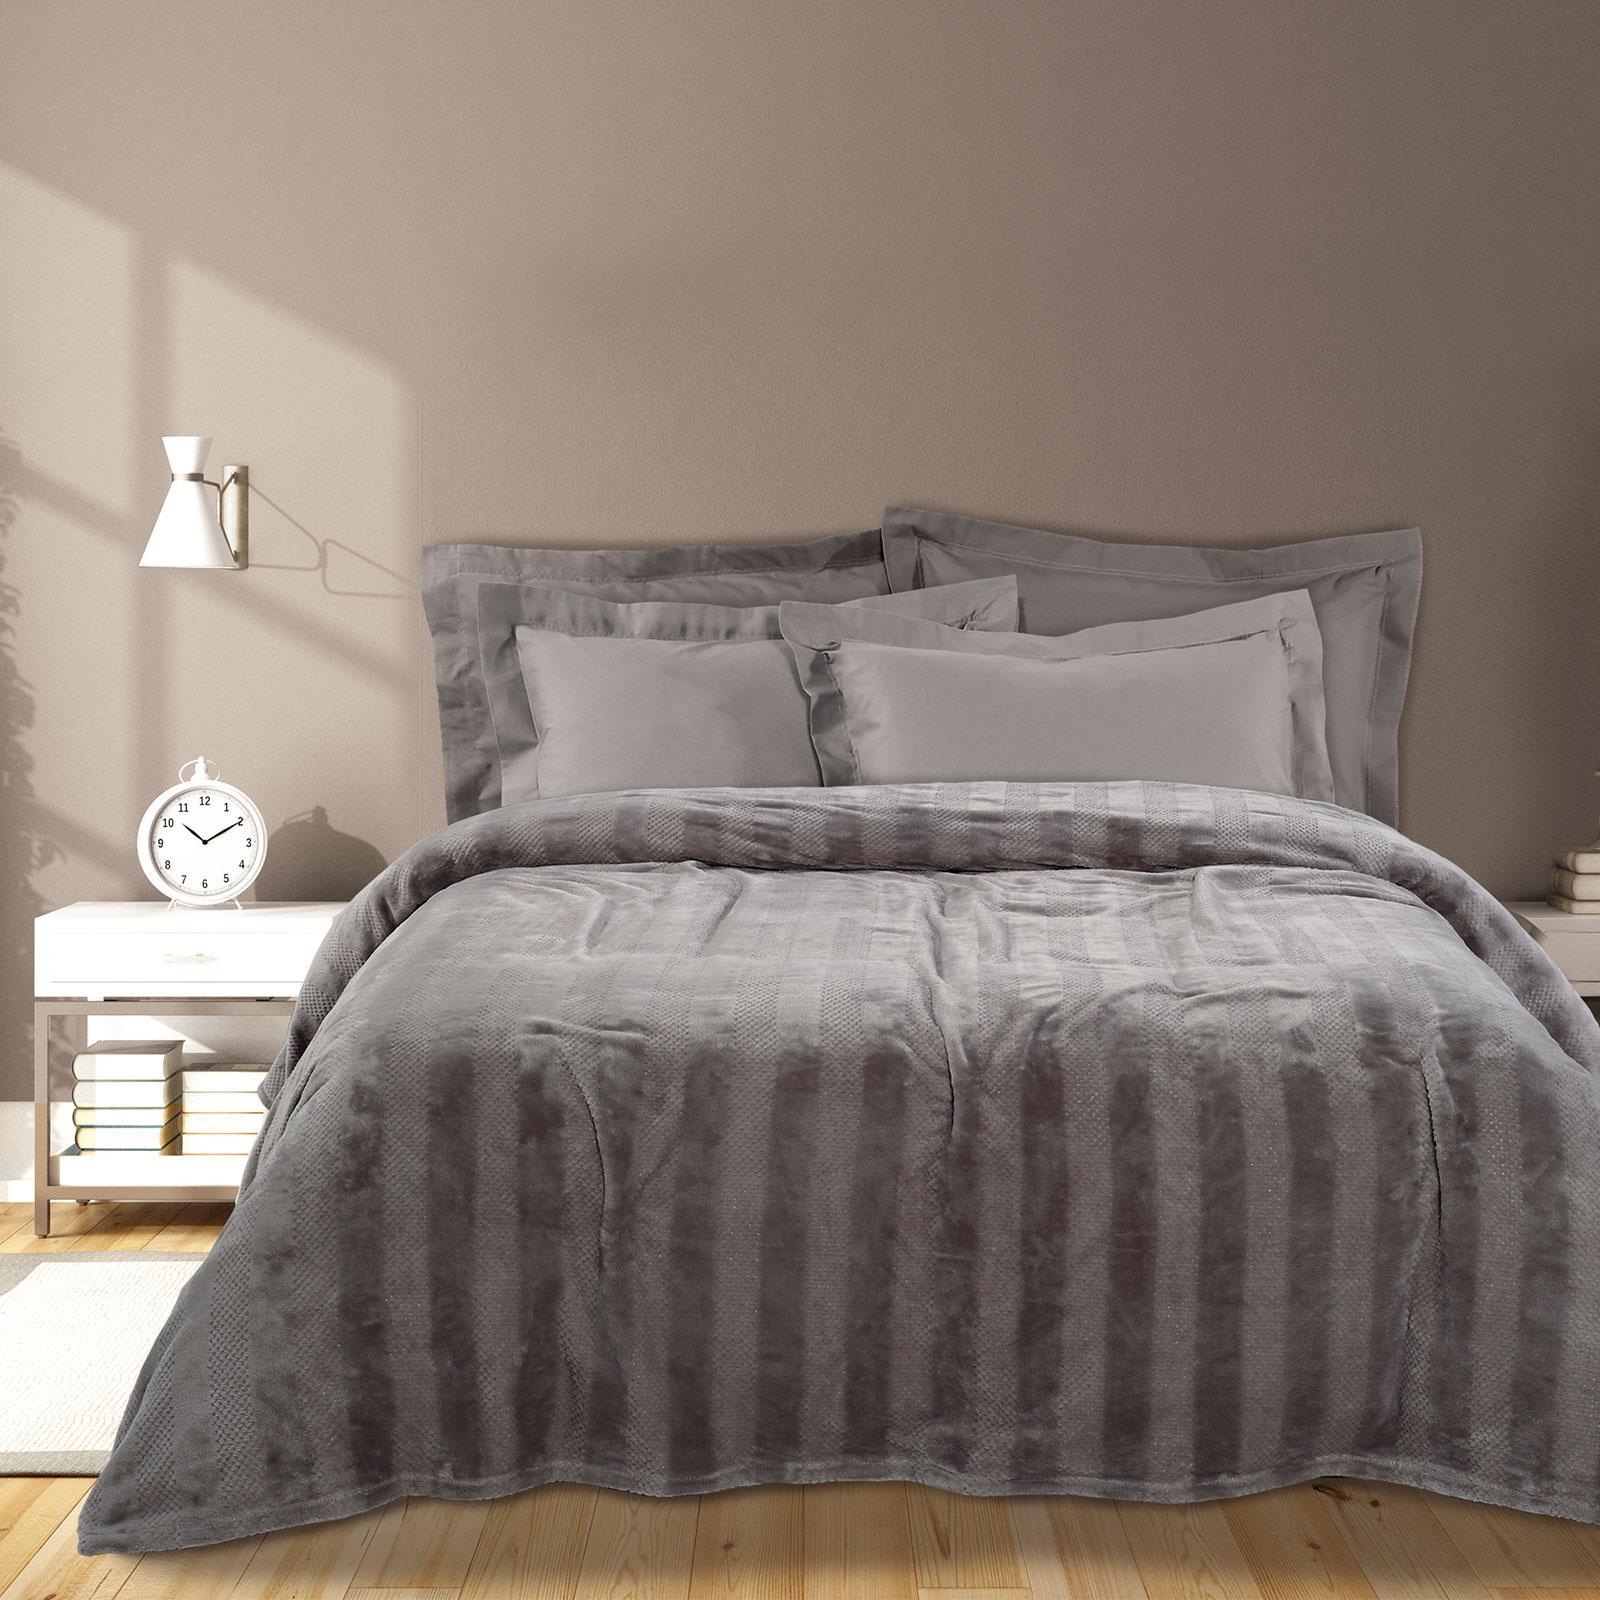 Das Home Κουβερτα Fleece 160Χ220 0465 Γκρι